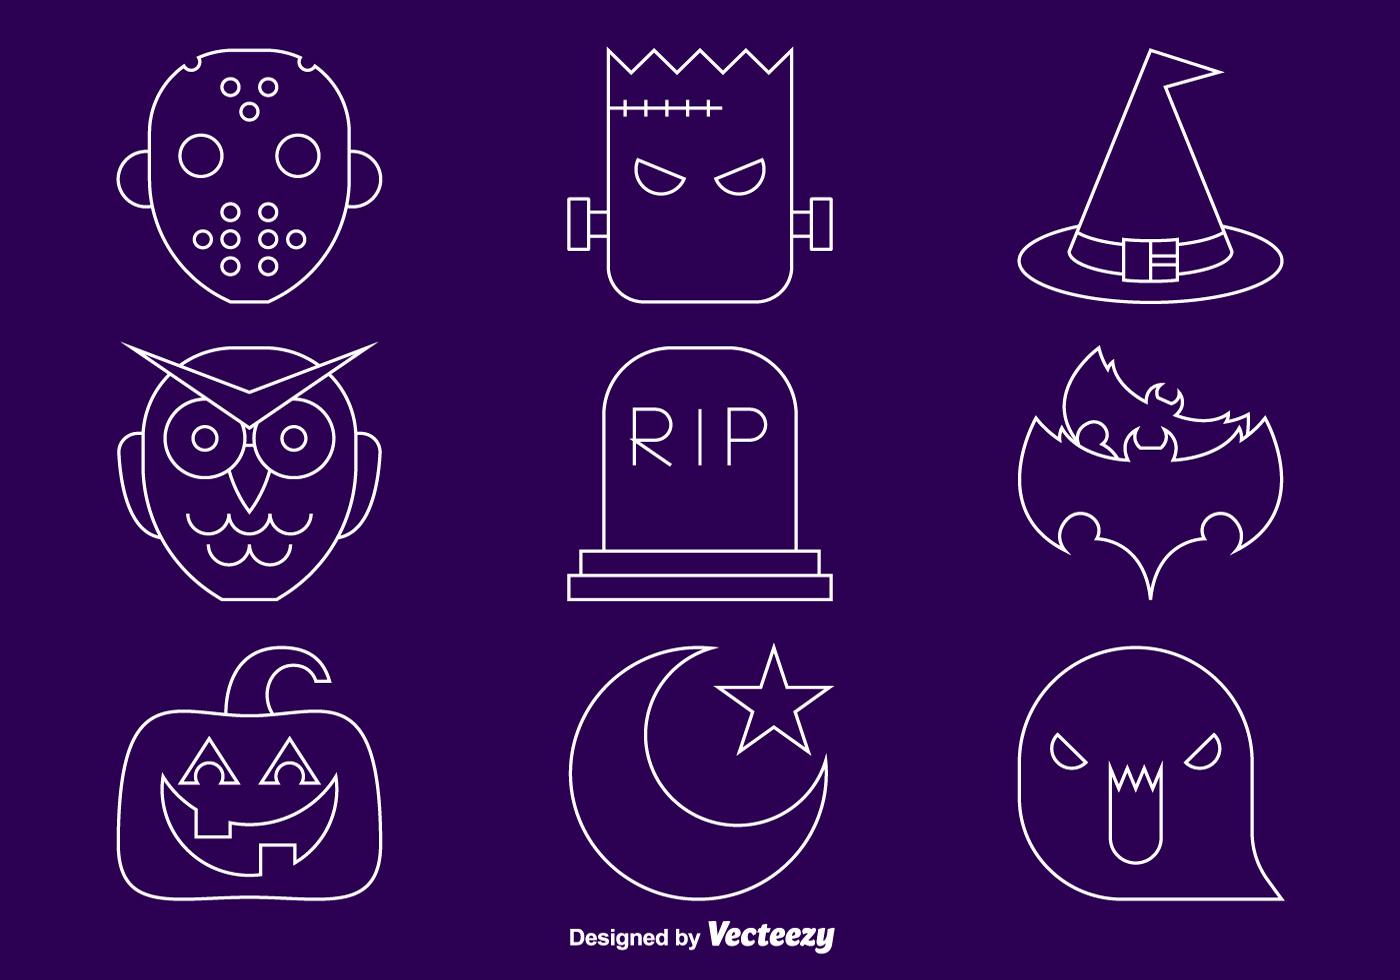 Halloween line icons - Download Free Vectors, Clipart ...